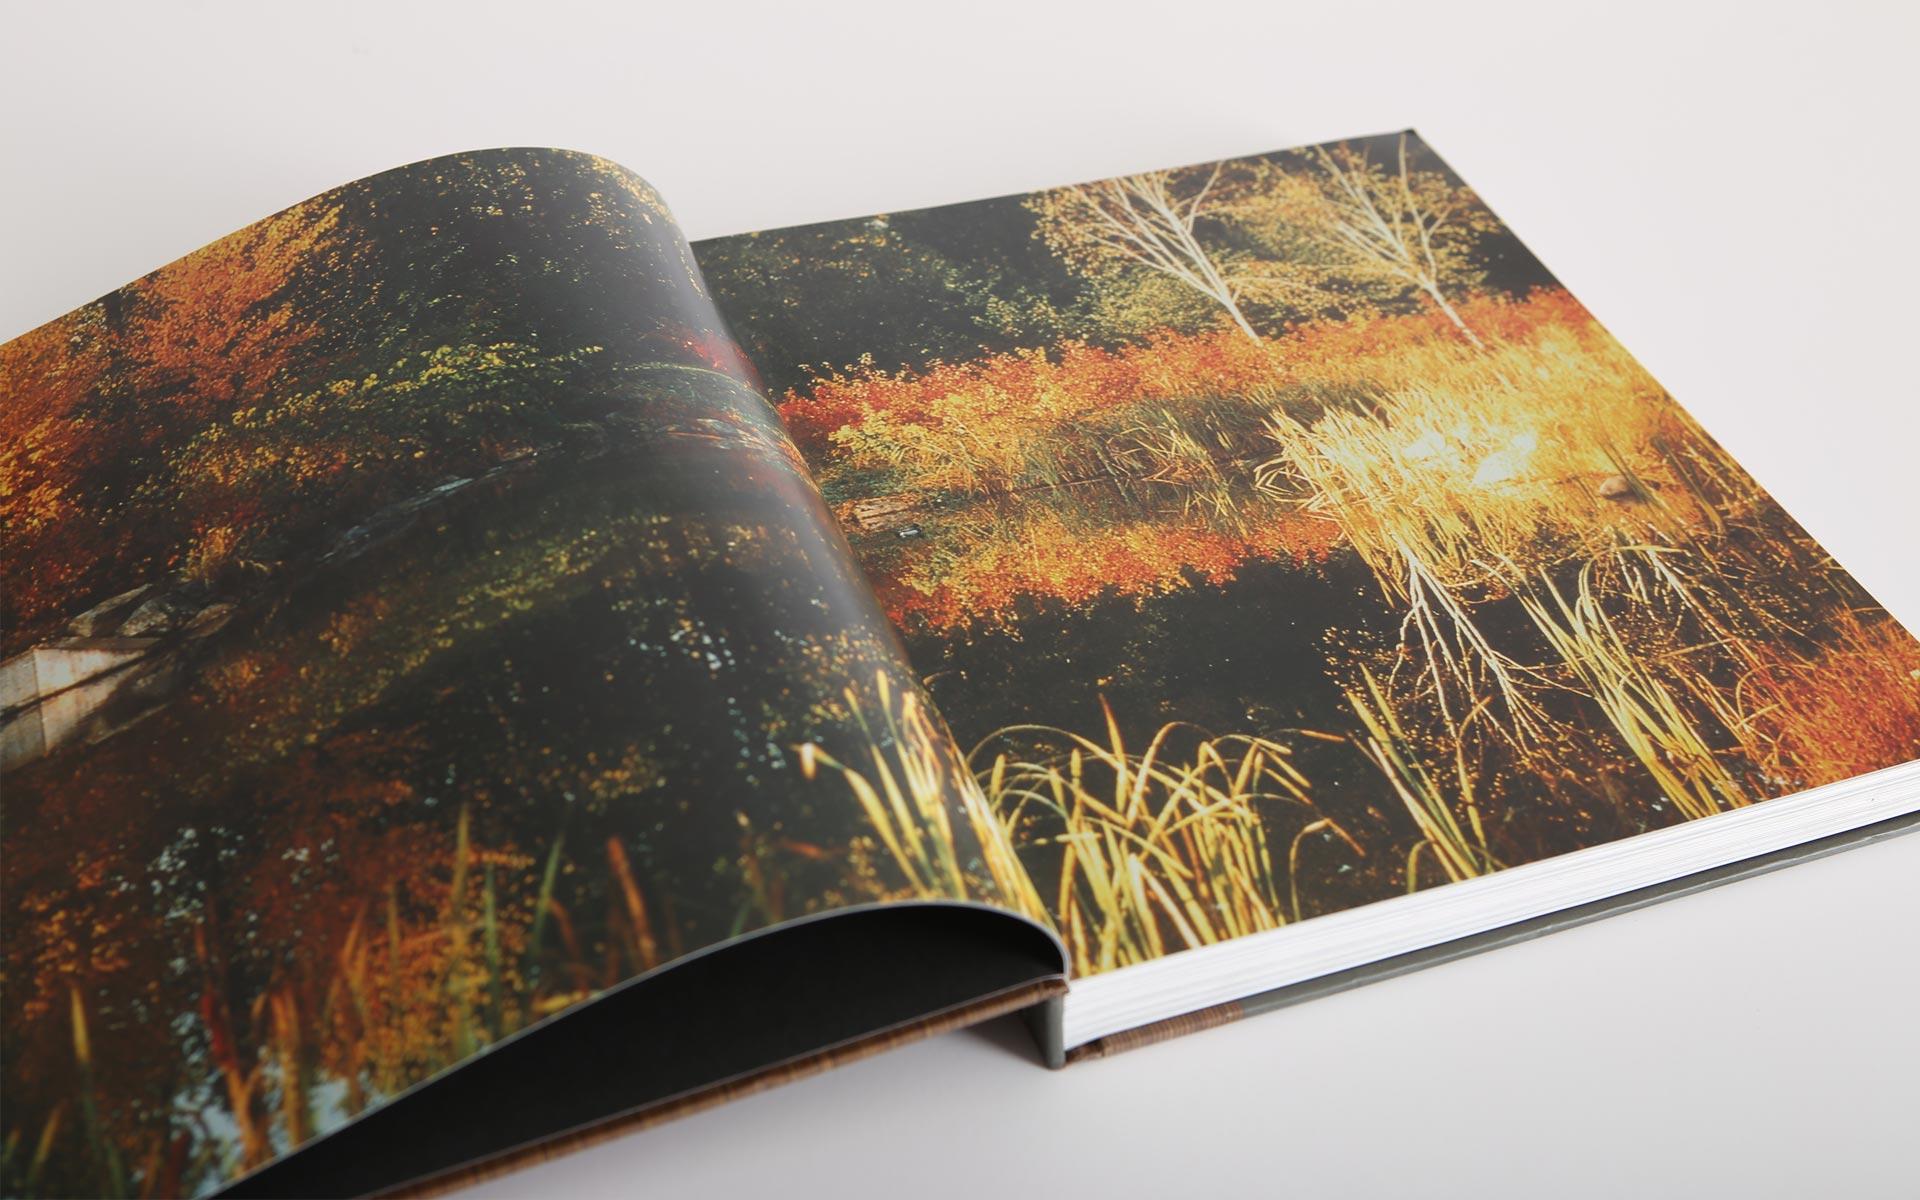 pfs-landscape-architects-book-design-3